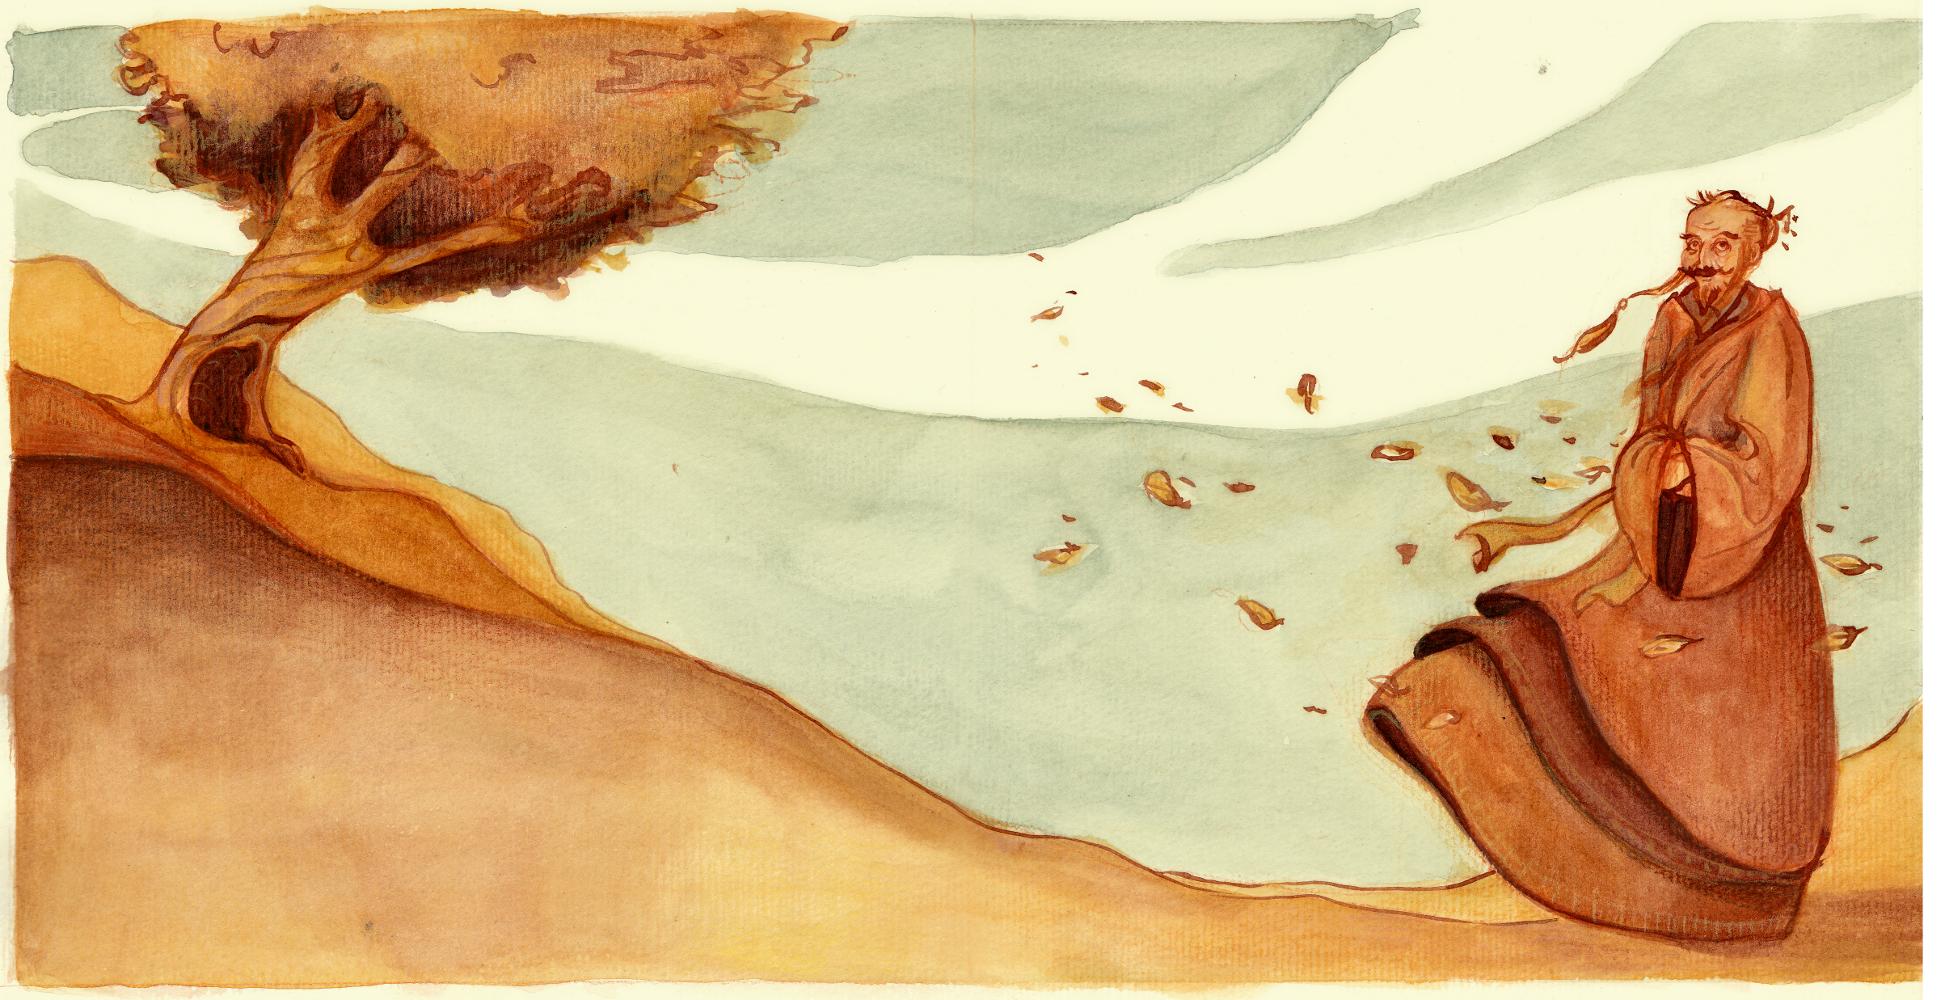 La tanière de Khalizya - Page 2 136623062669031